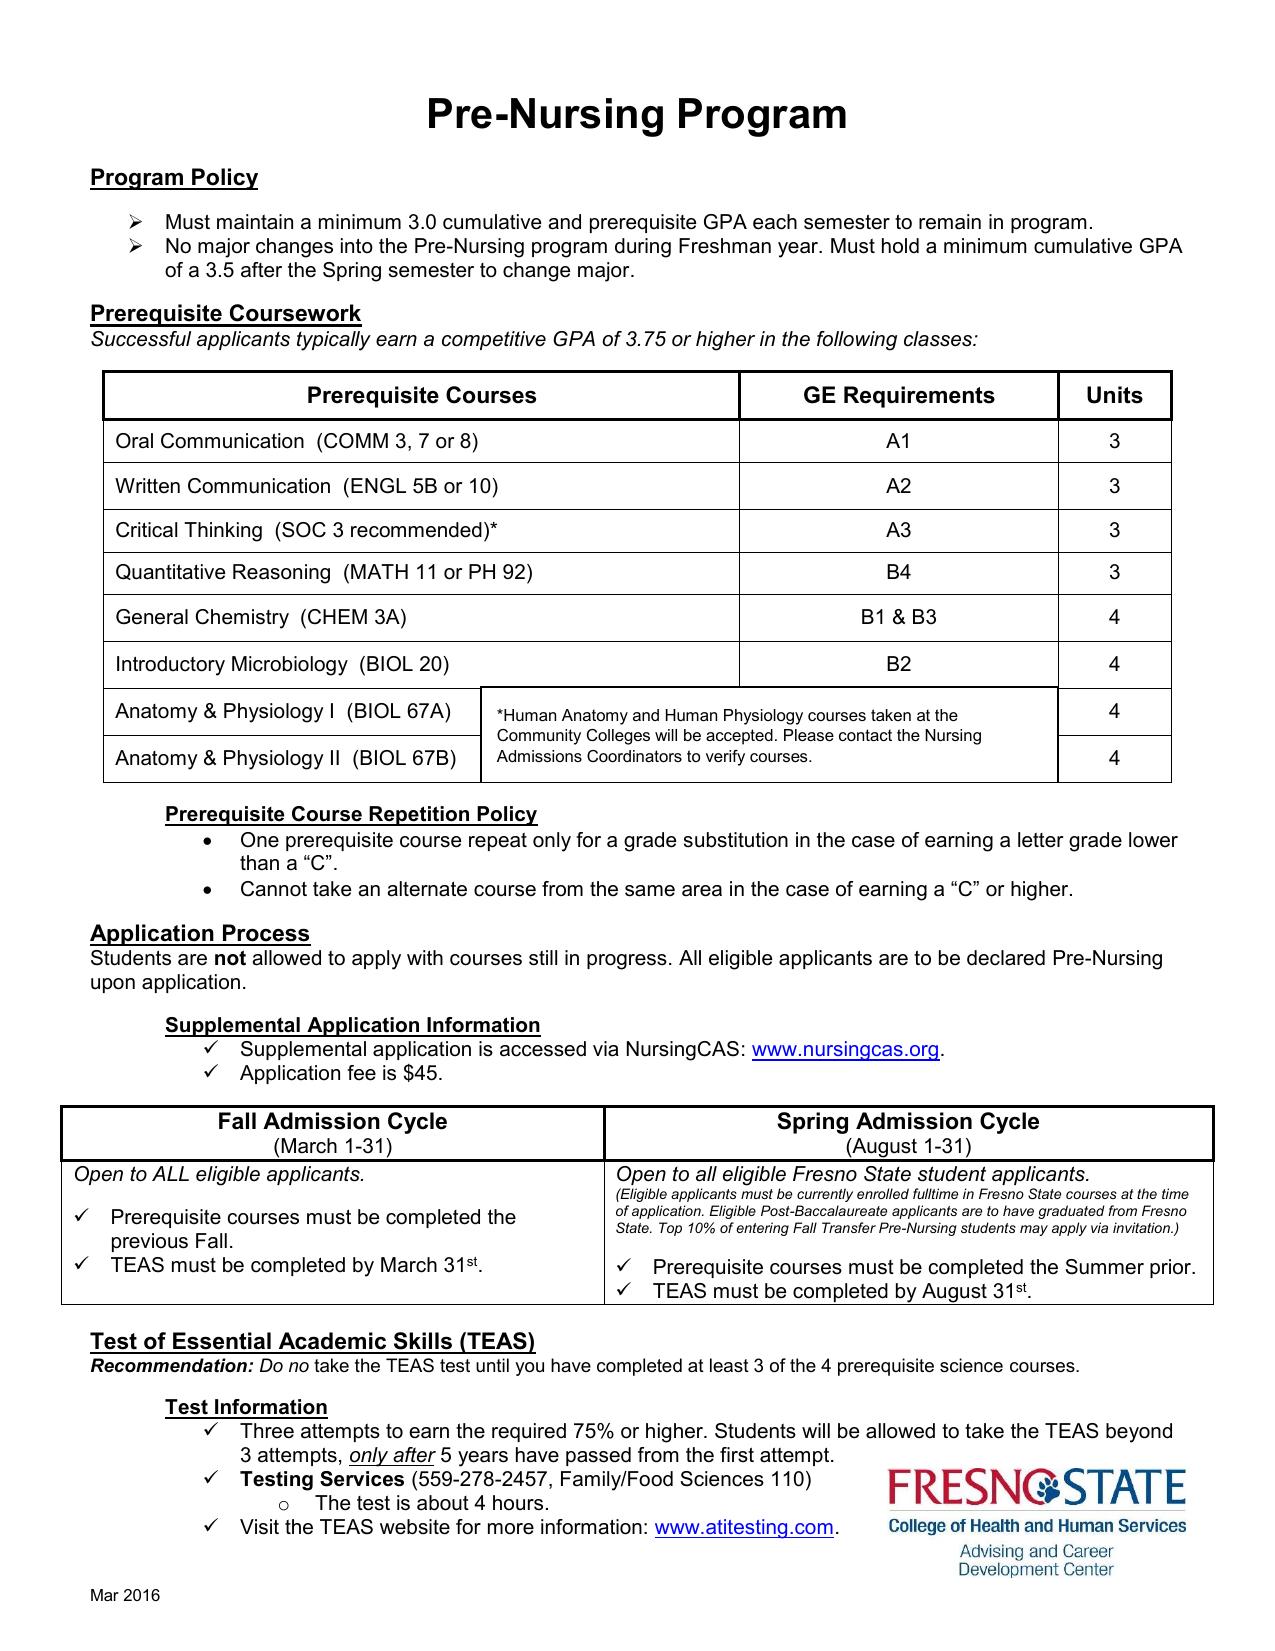 Pre-Nursing Program Program Policy